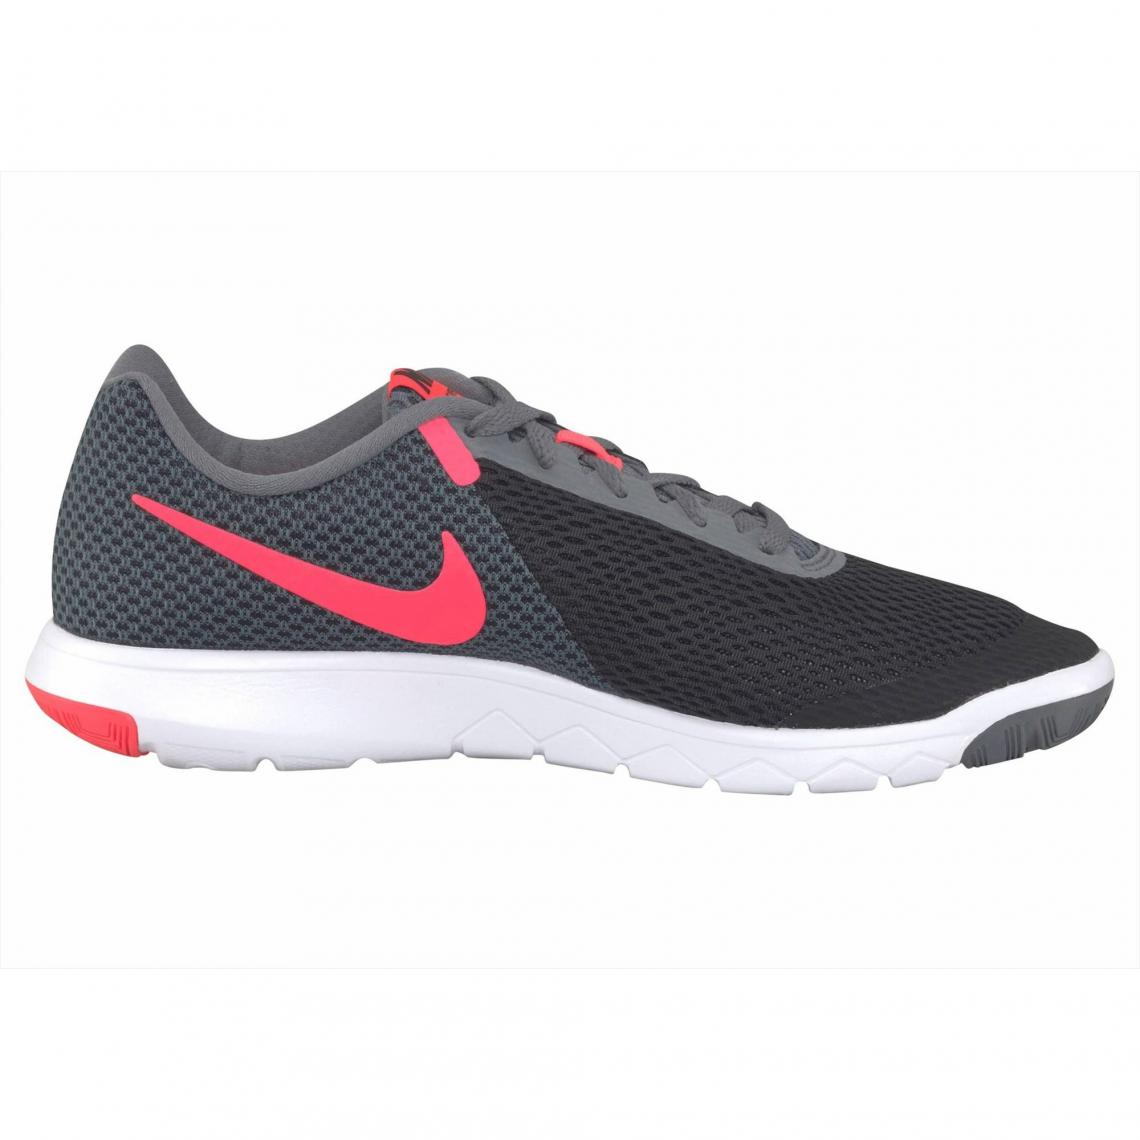 on sale 6659d eeb89 Chaussures de sport Nike